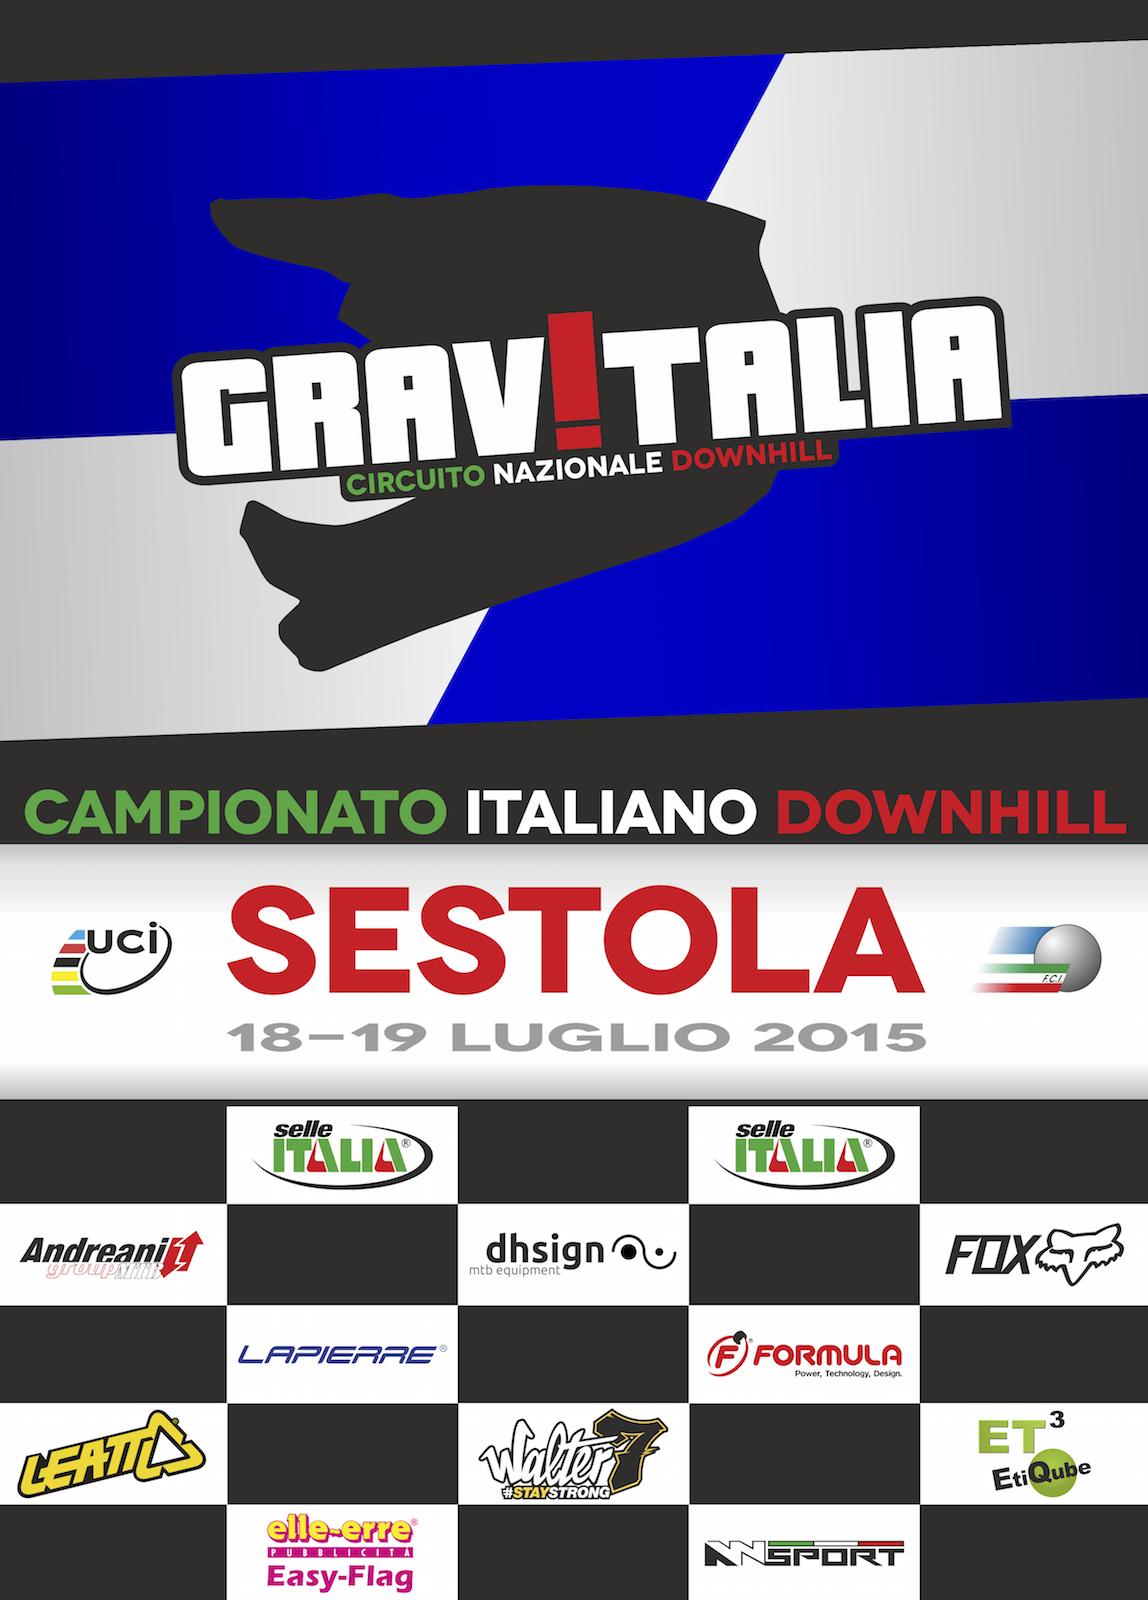 locandina 2015 italiano